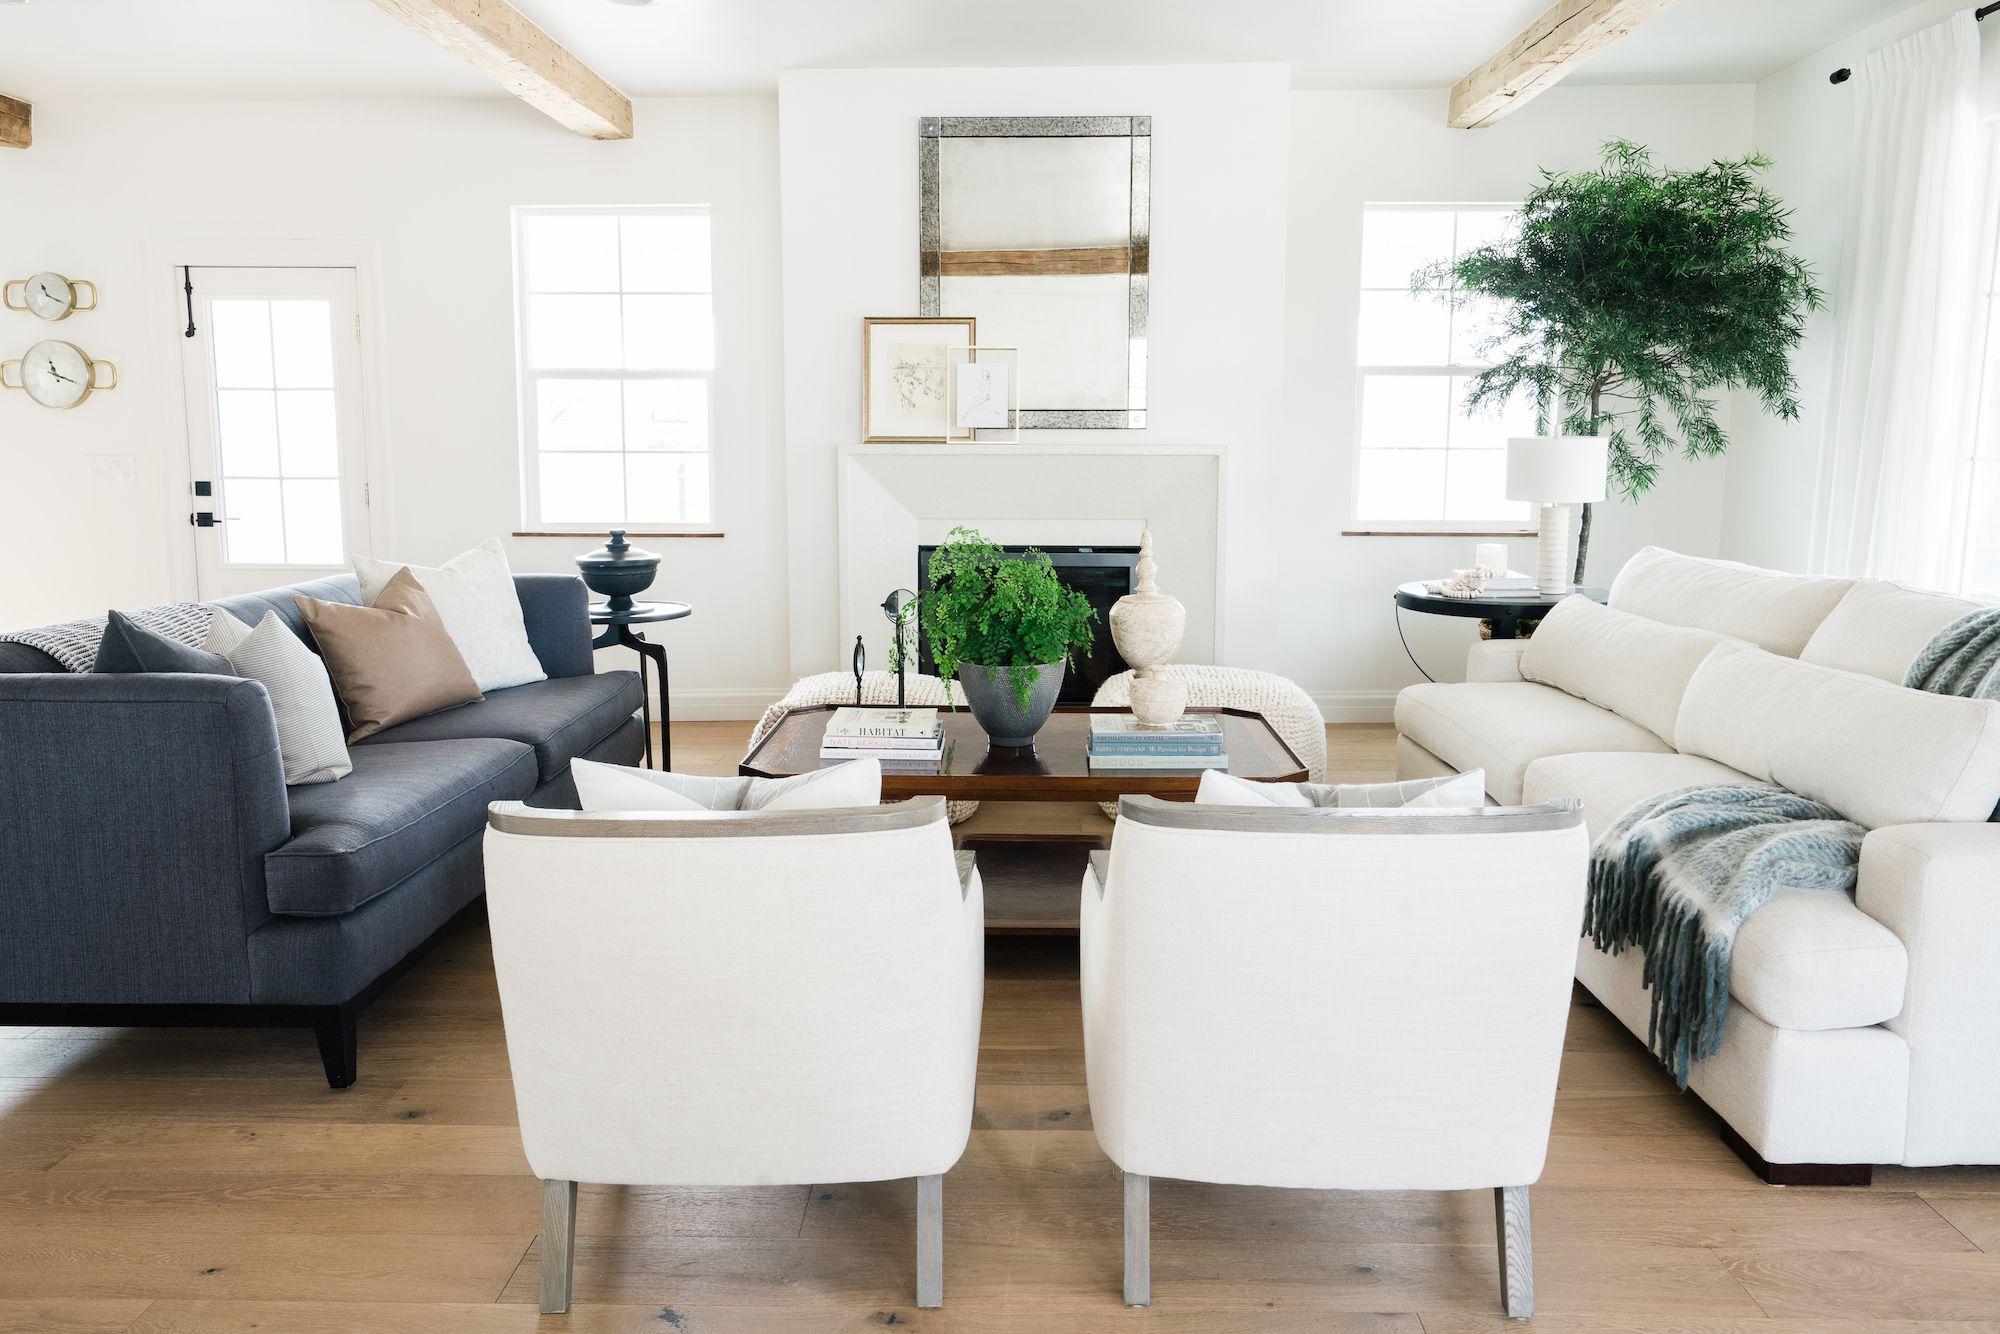 Sofa Pairing Tips House Of Jade Interiors Blog In 2020 Farm House Living Room Living Room Decor Neutral Living Room #two #different #sofas #in #living #room